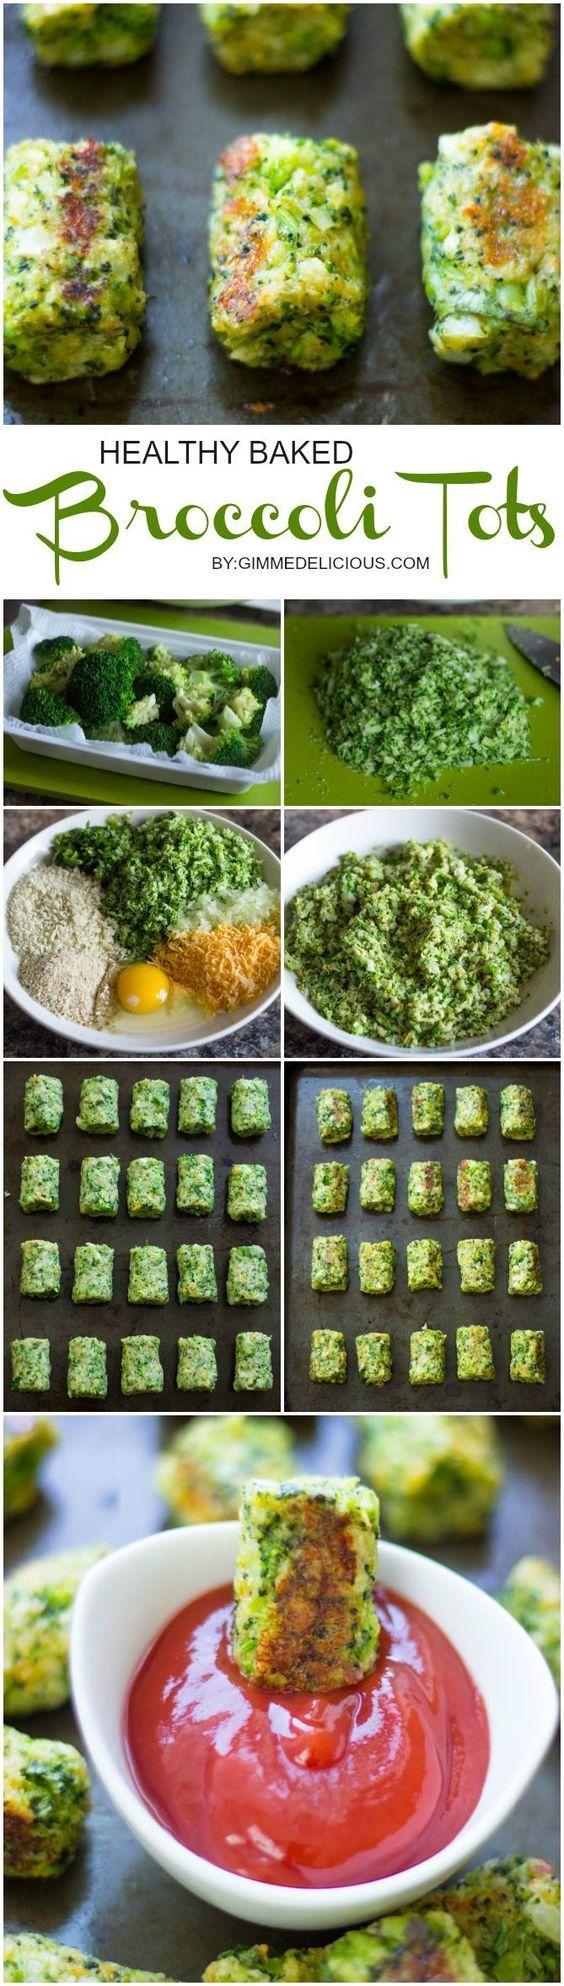 Healthy Baked Broccoli Tots 35 dk yapılış süresi, hazırlama